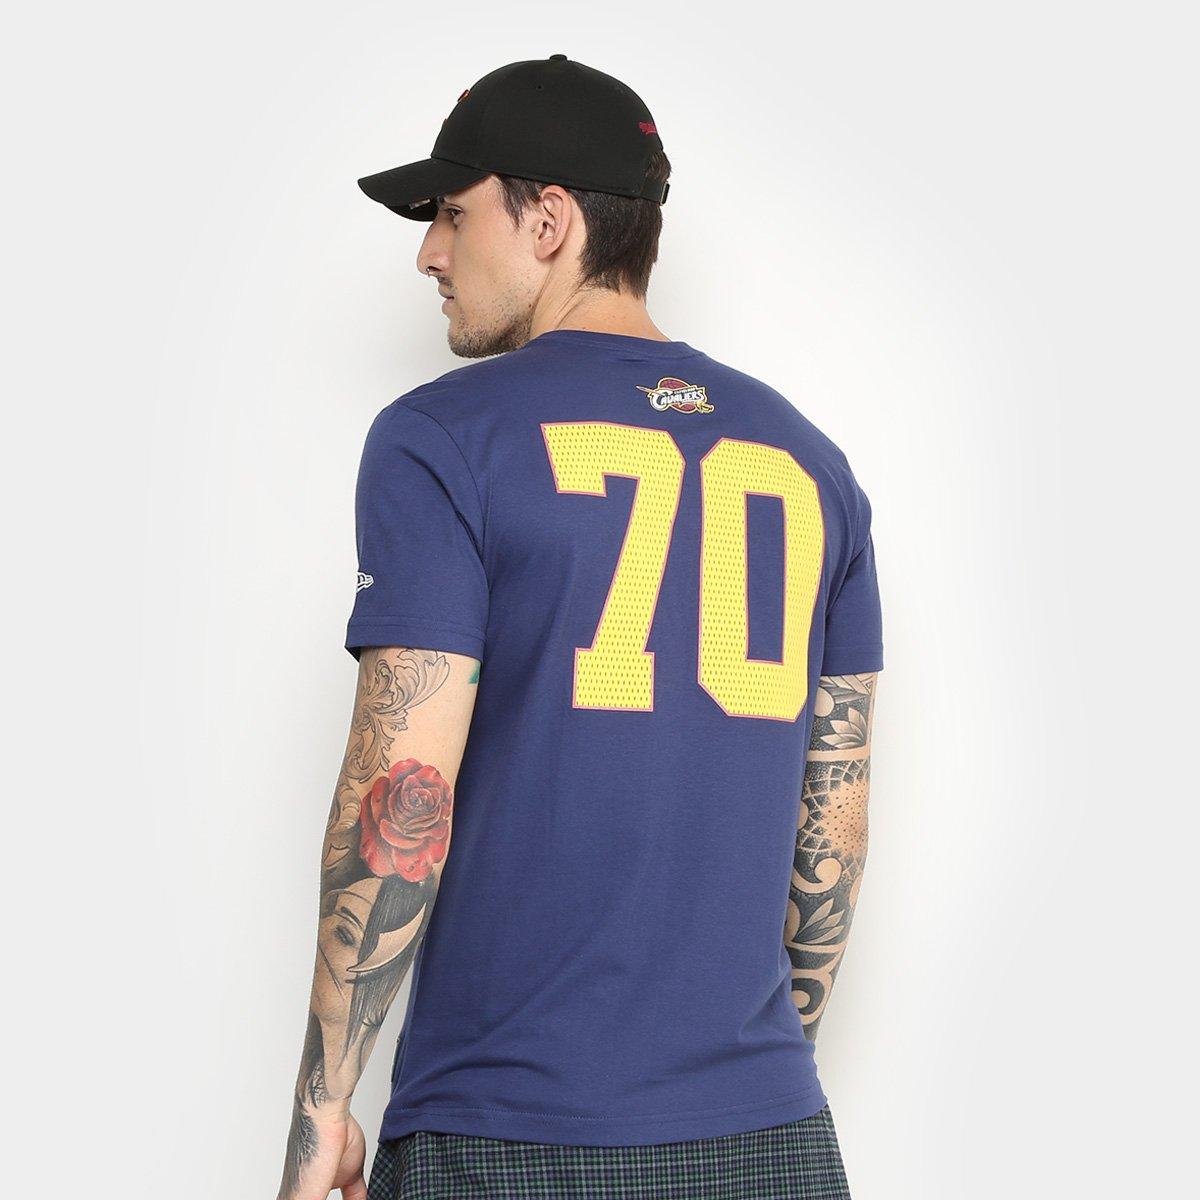 d91da5e66 ... Camiseta NBA Cleveland Cavaliers New Era Game Piece Masculina ...